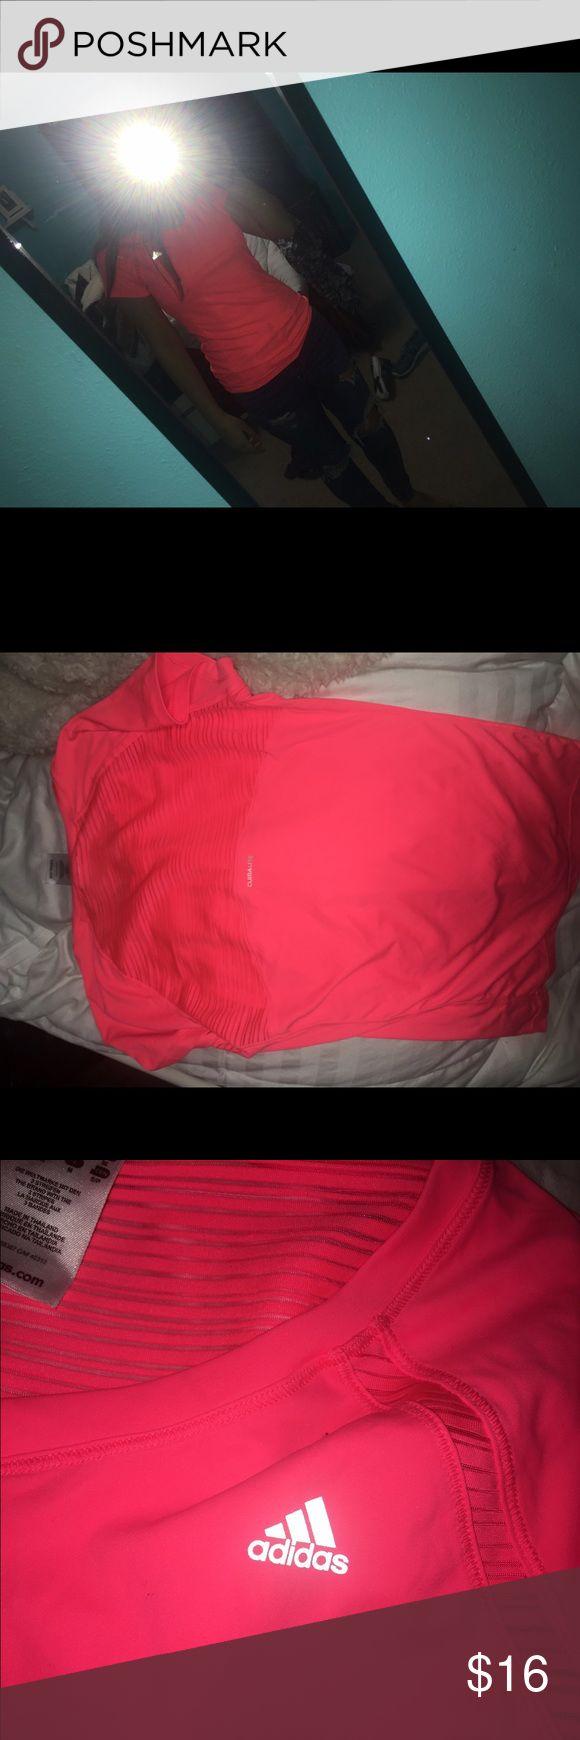 Adidas workout shirt Adorable and never worn! Adidas Tops